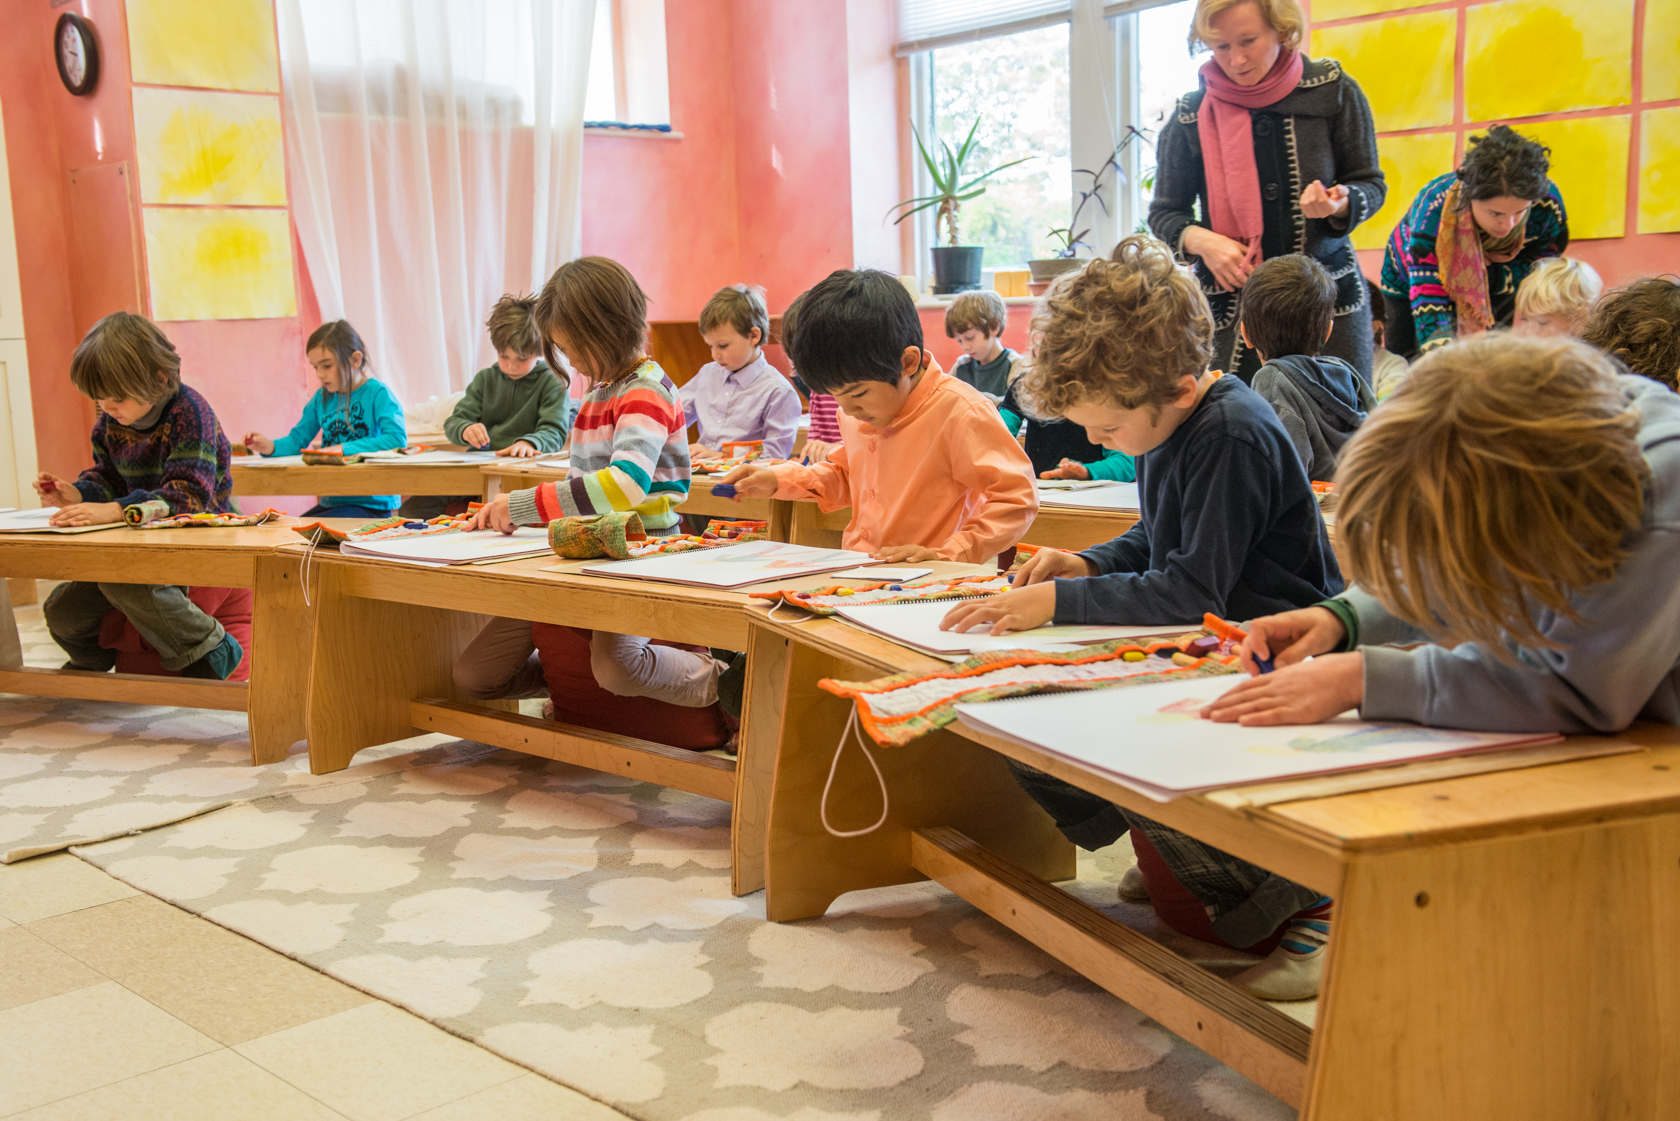 Hummingbird Next Collaborative Preschool North Marin Waldorf School sensory integration